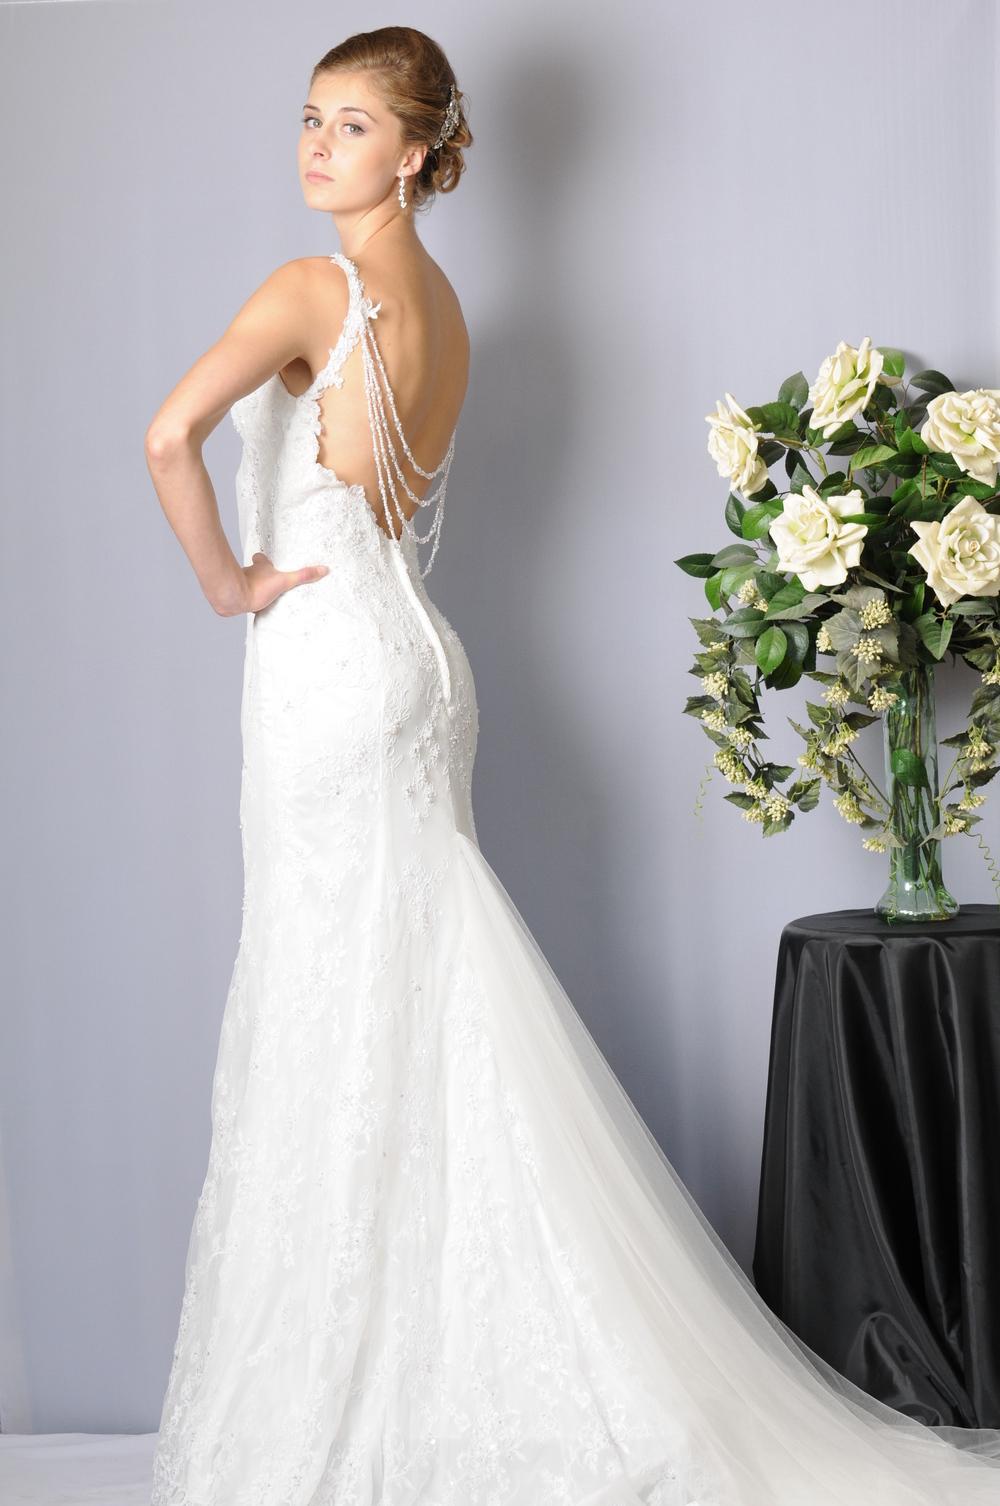 Wedding+Chantilly+Bridal+Dress.jpeg